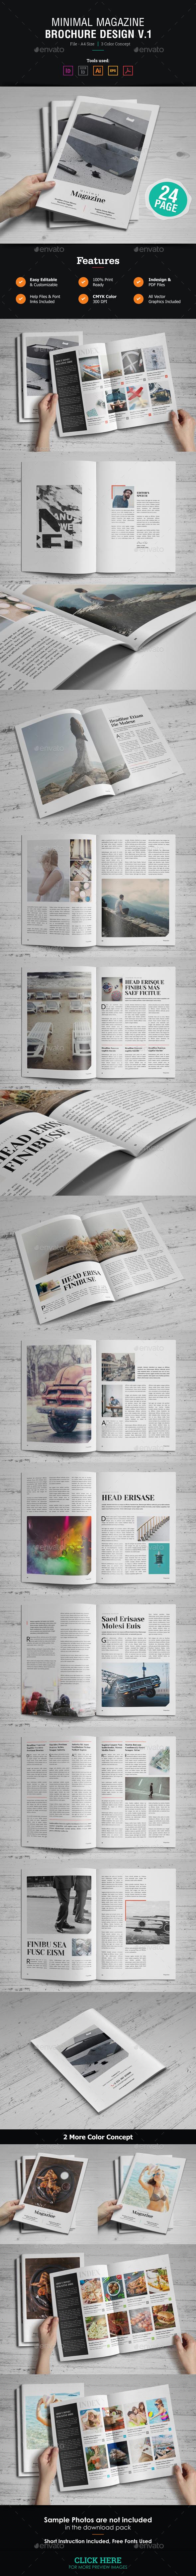 GraphicRiver Minimal Magazine Design 21038363